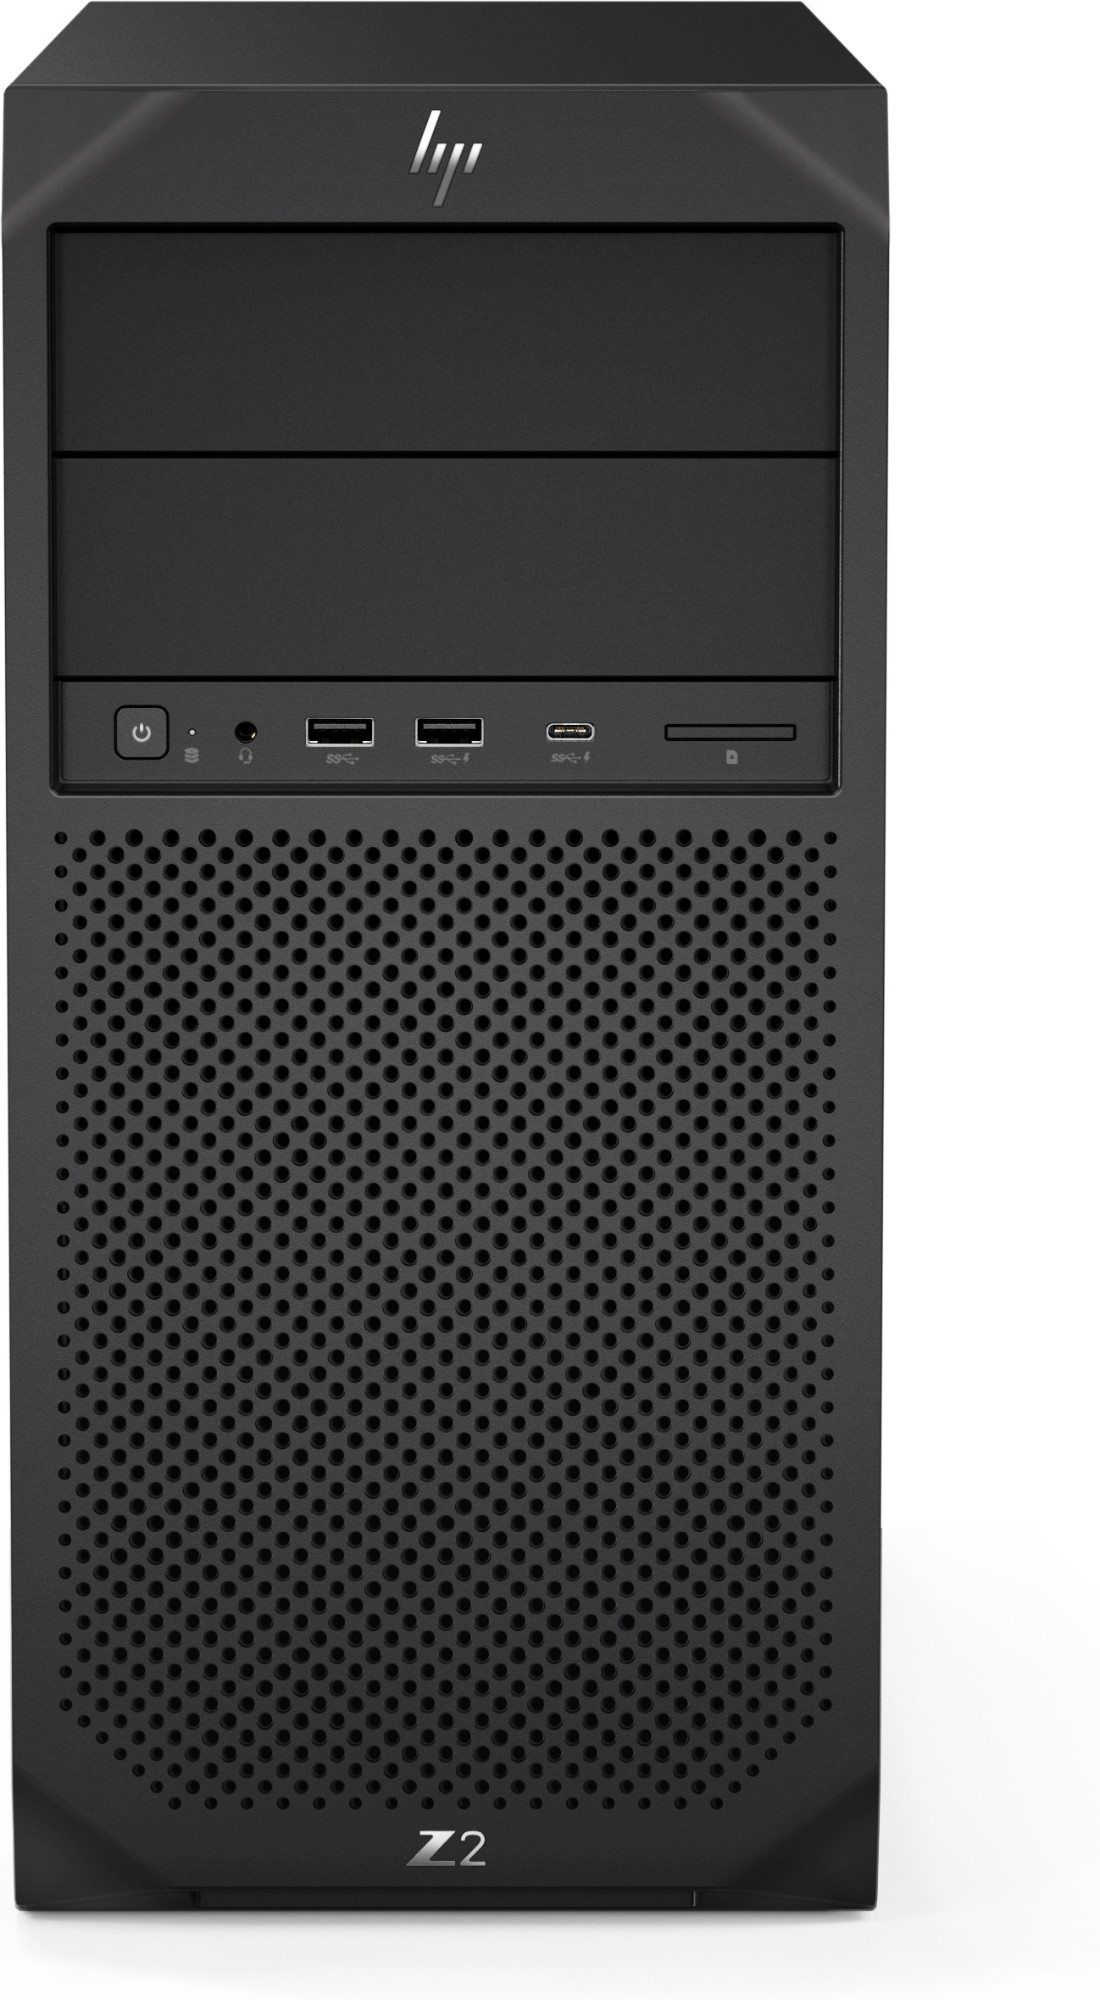 HP Z2 G4 8th gen Intel® Core™ i7 i7-8700K 16 GB DDR4-SDRAM 256 GB SSD Tower Black Workstation Windows 10 Pro